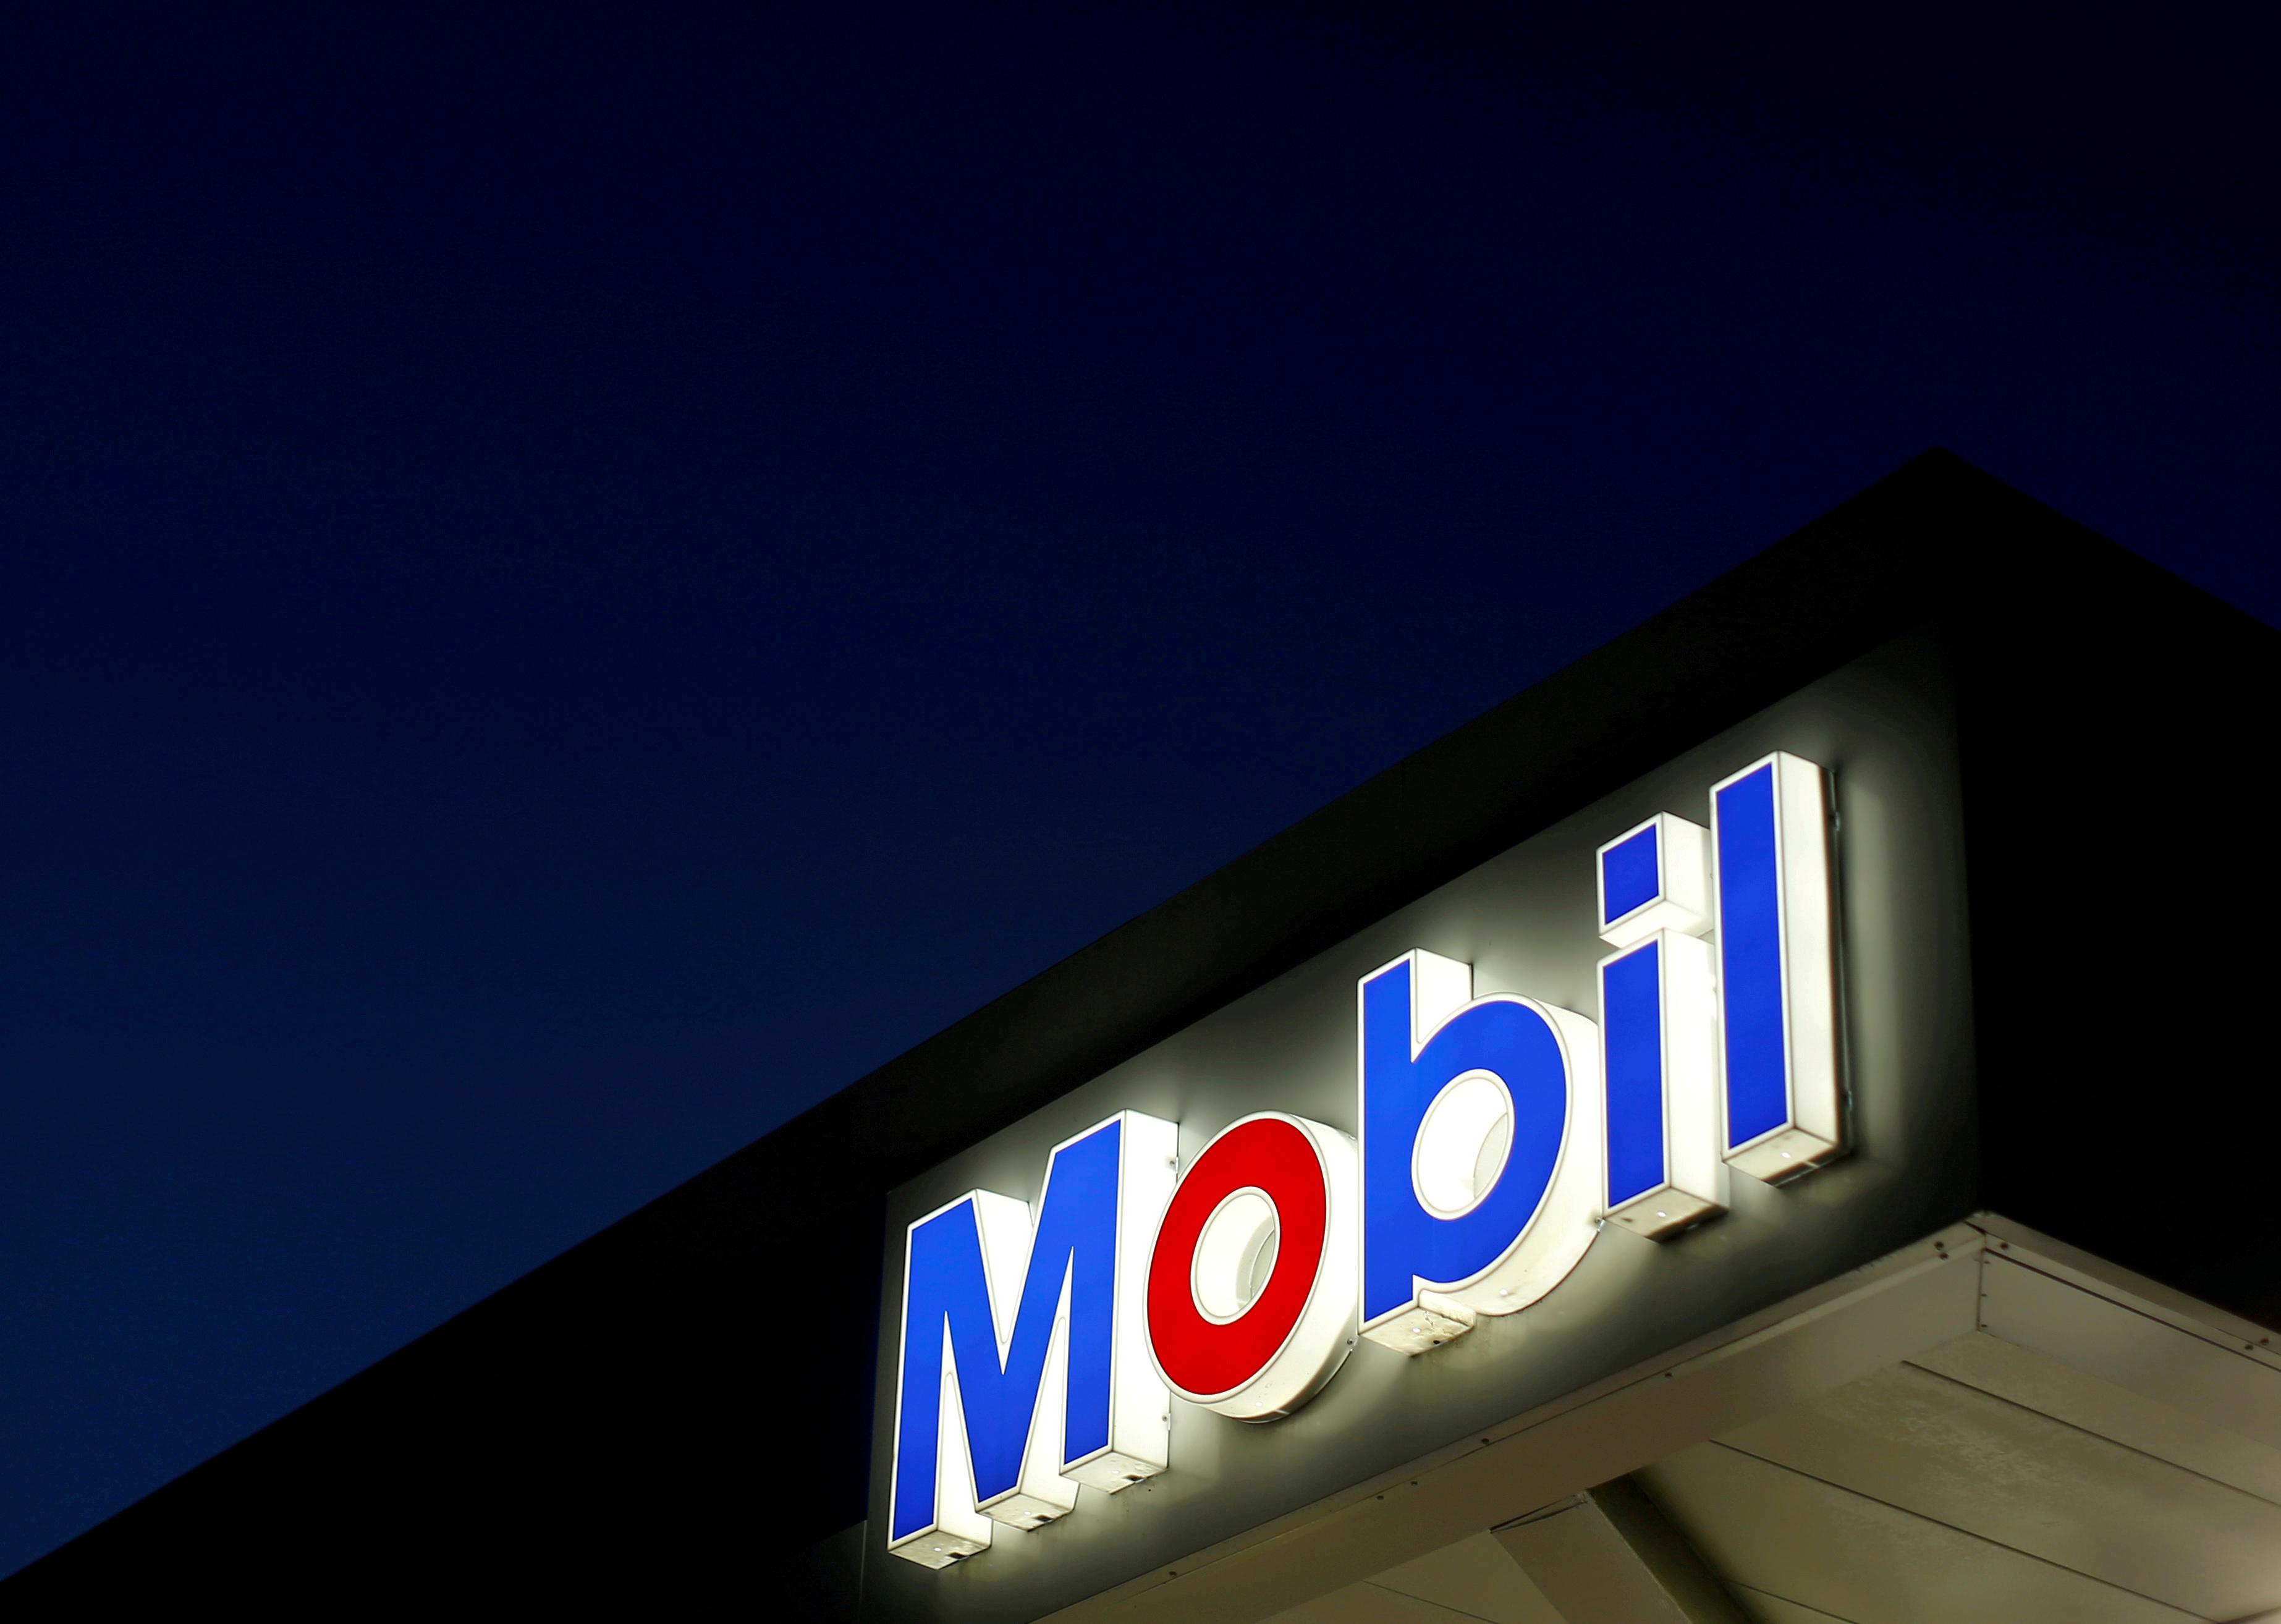 The logo of Exxon Mobil is seen in Encinitas, California.  REUTERS/Mike Blake